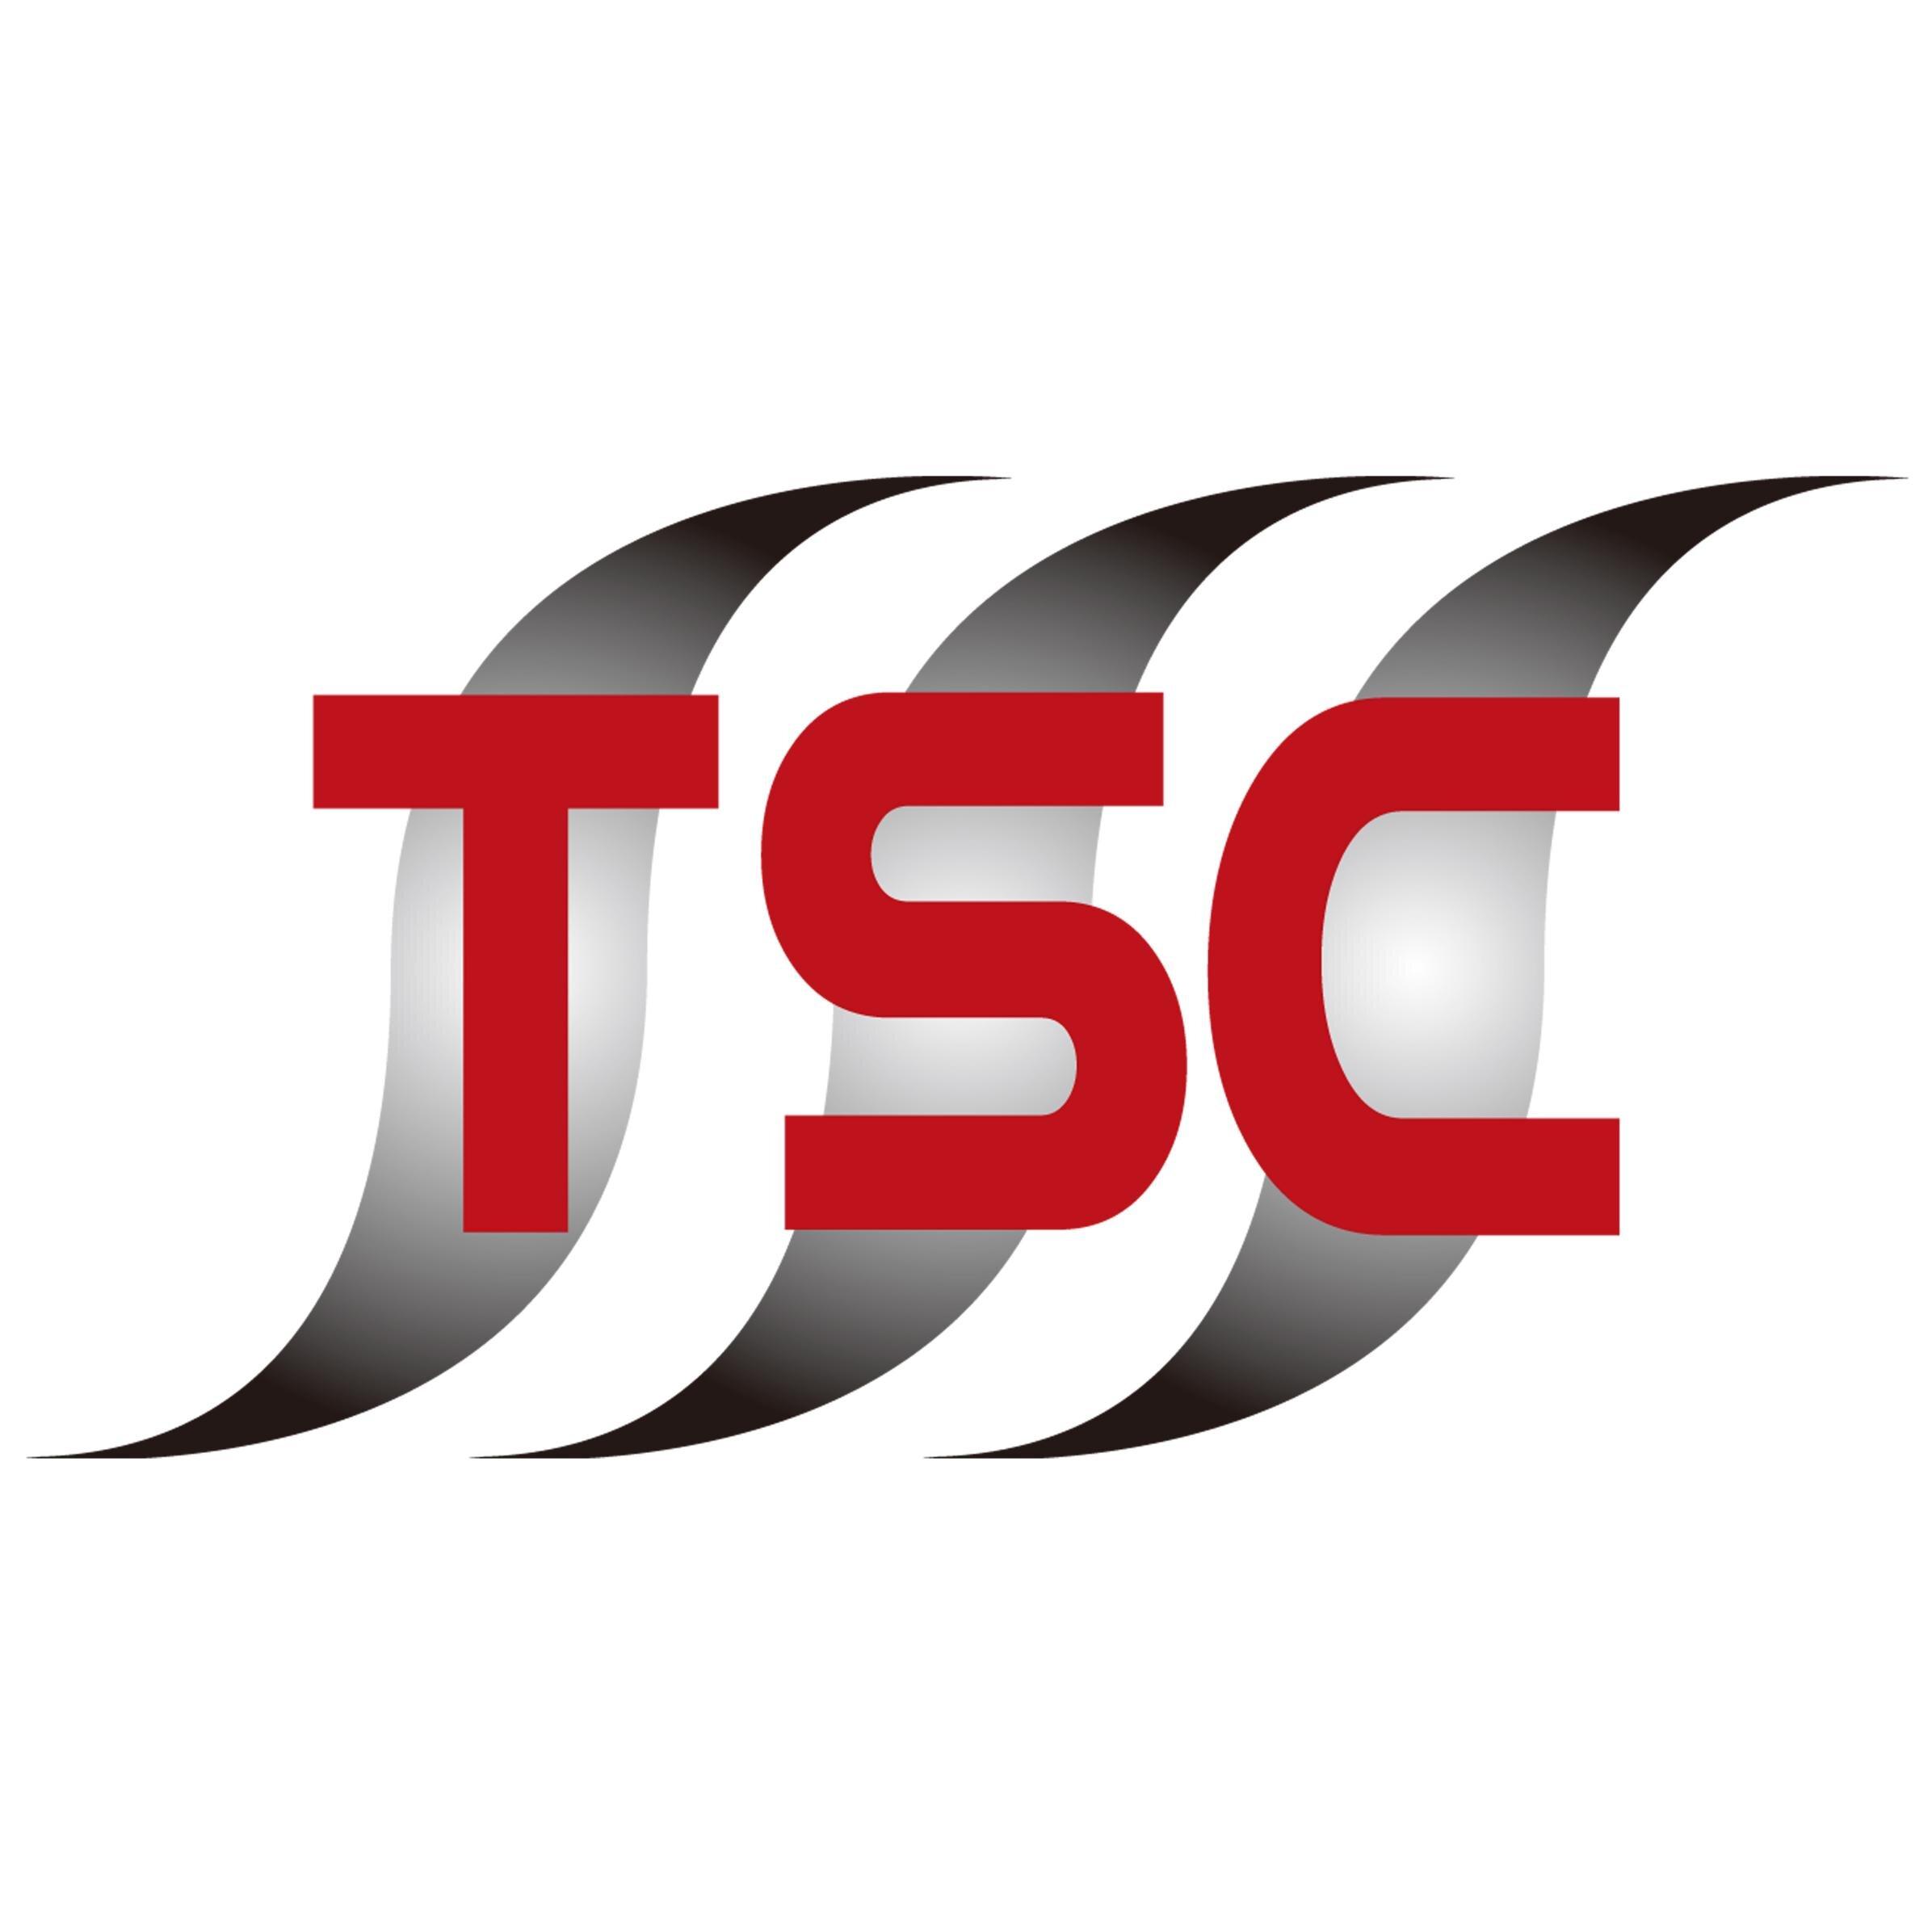 tsc tscgroup twitter